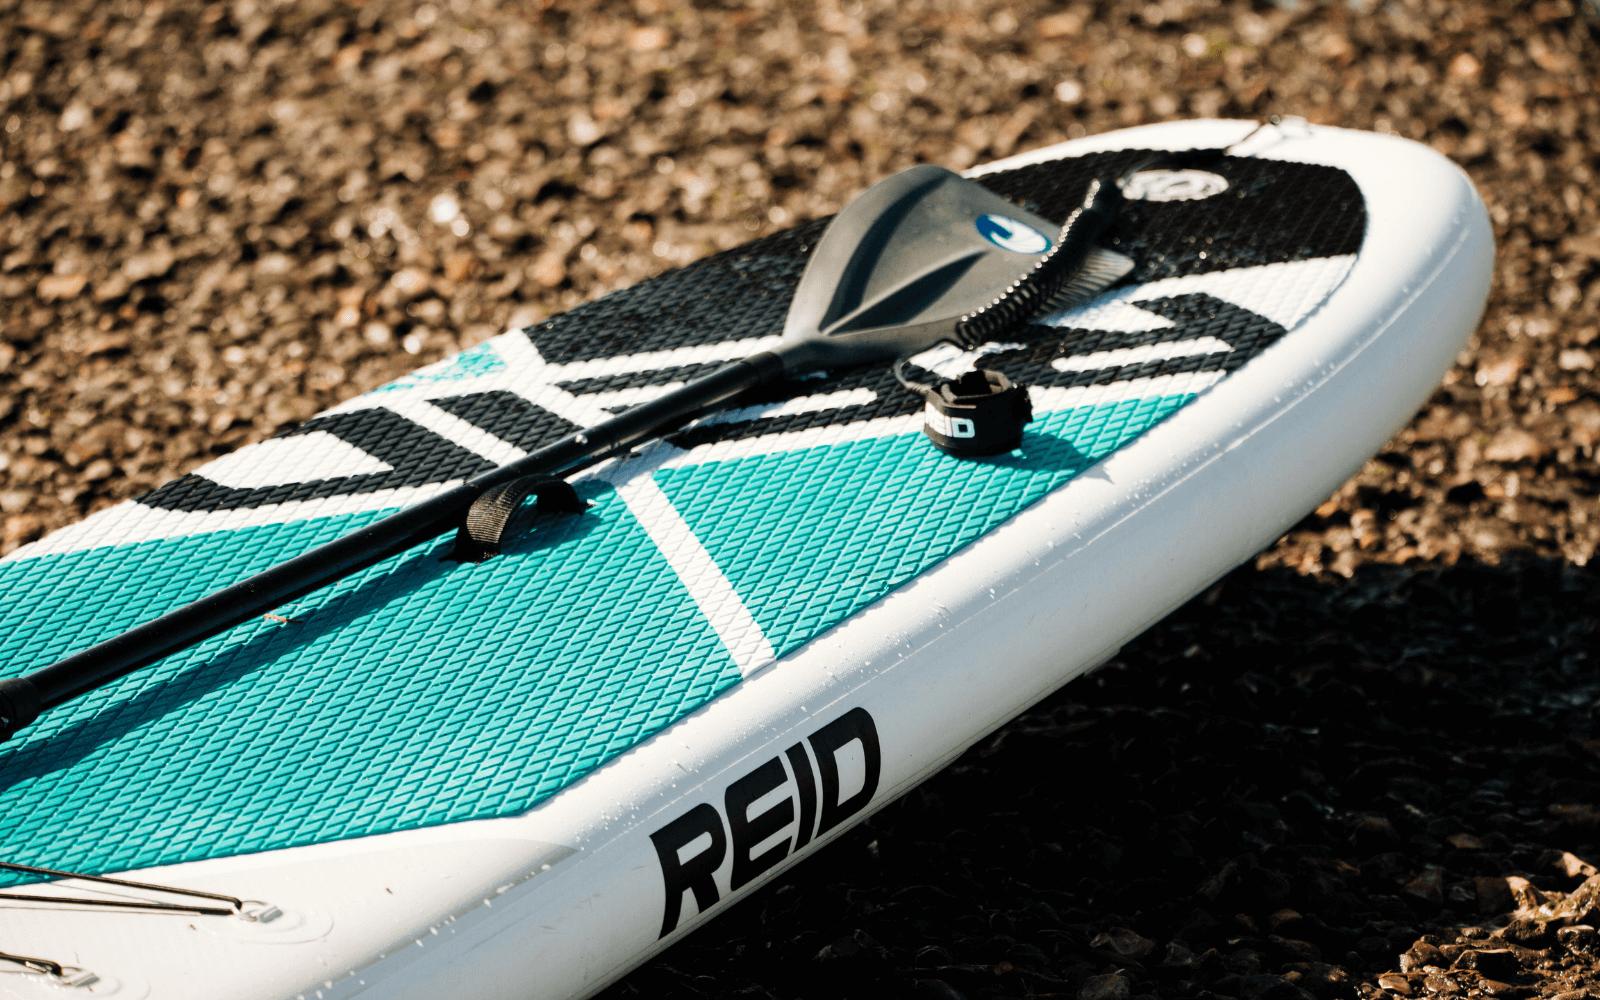 Lifestyle Images 1600 x 1000 2 3 1 1 - Reid ® - Reid Waikiki 10'6 Paddleboard